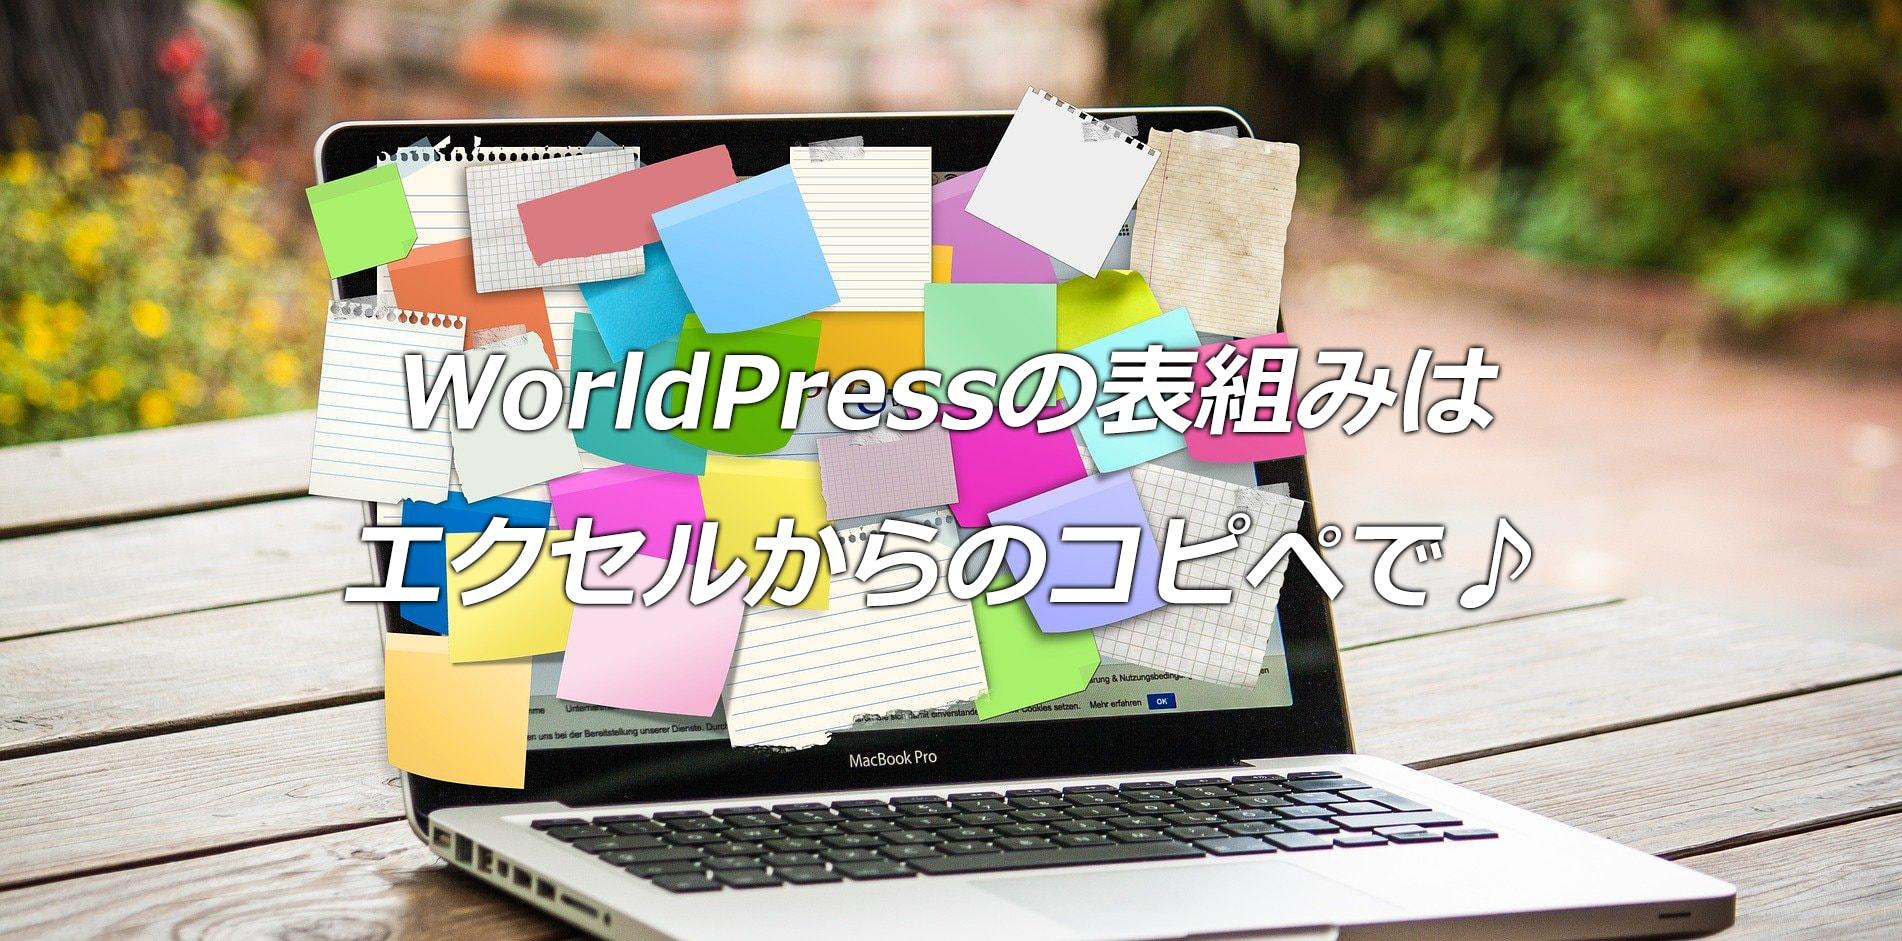 WordPressの表組はエクセルからコピペ プラグイン不要